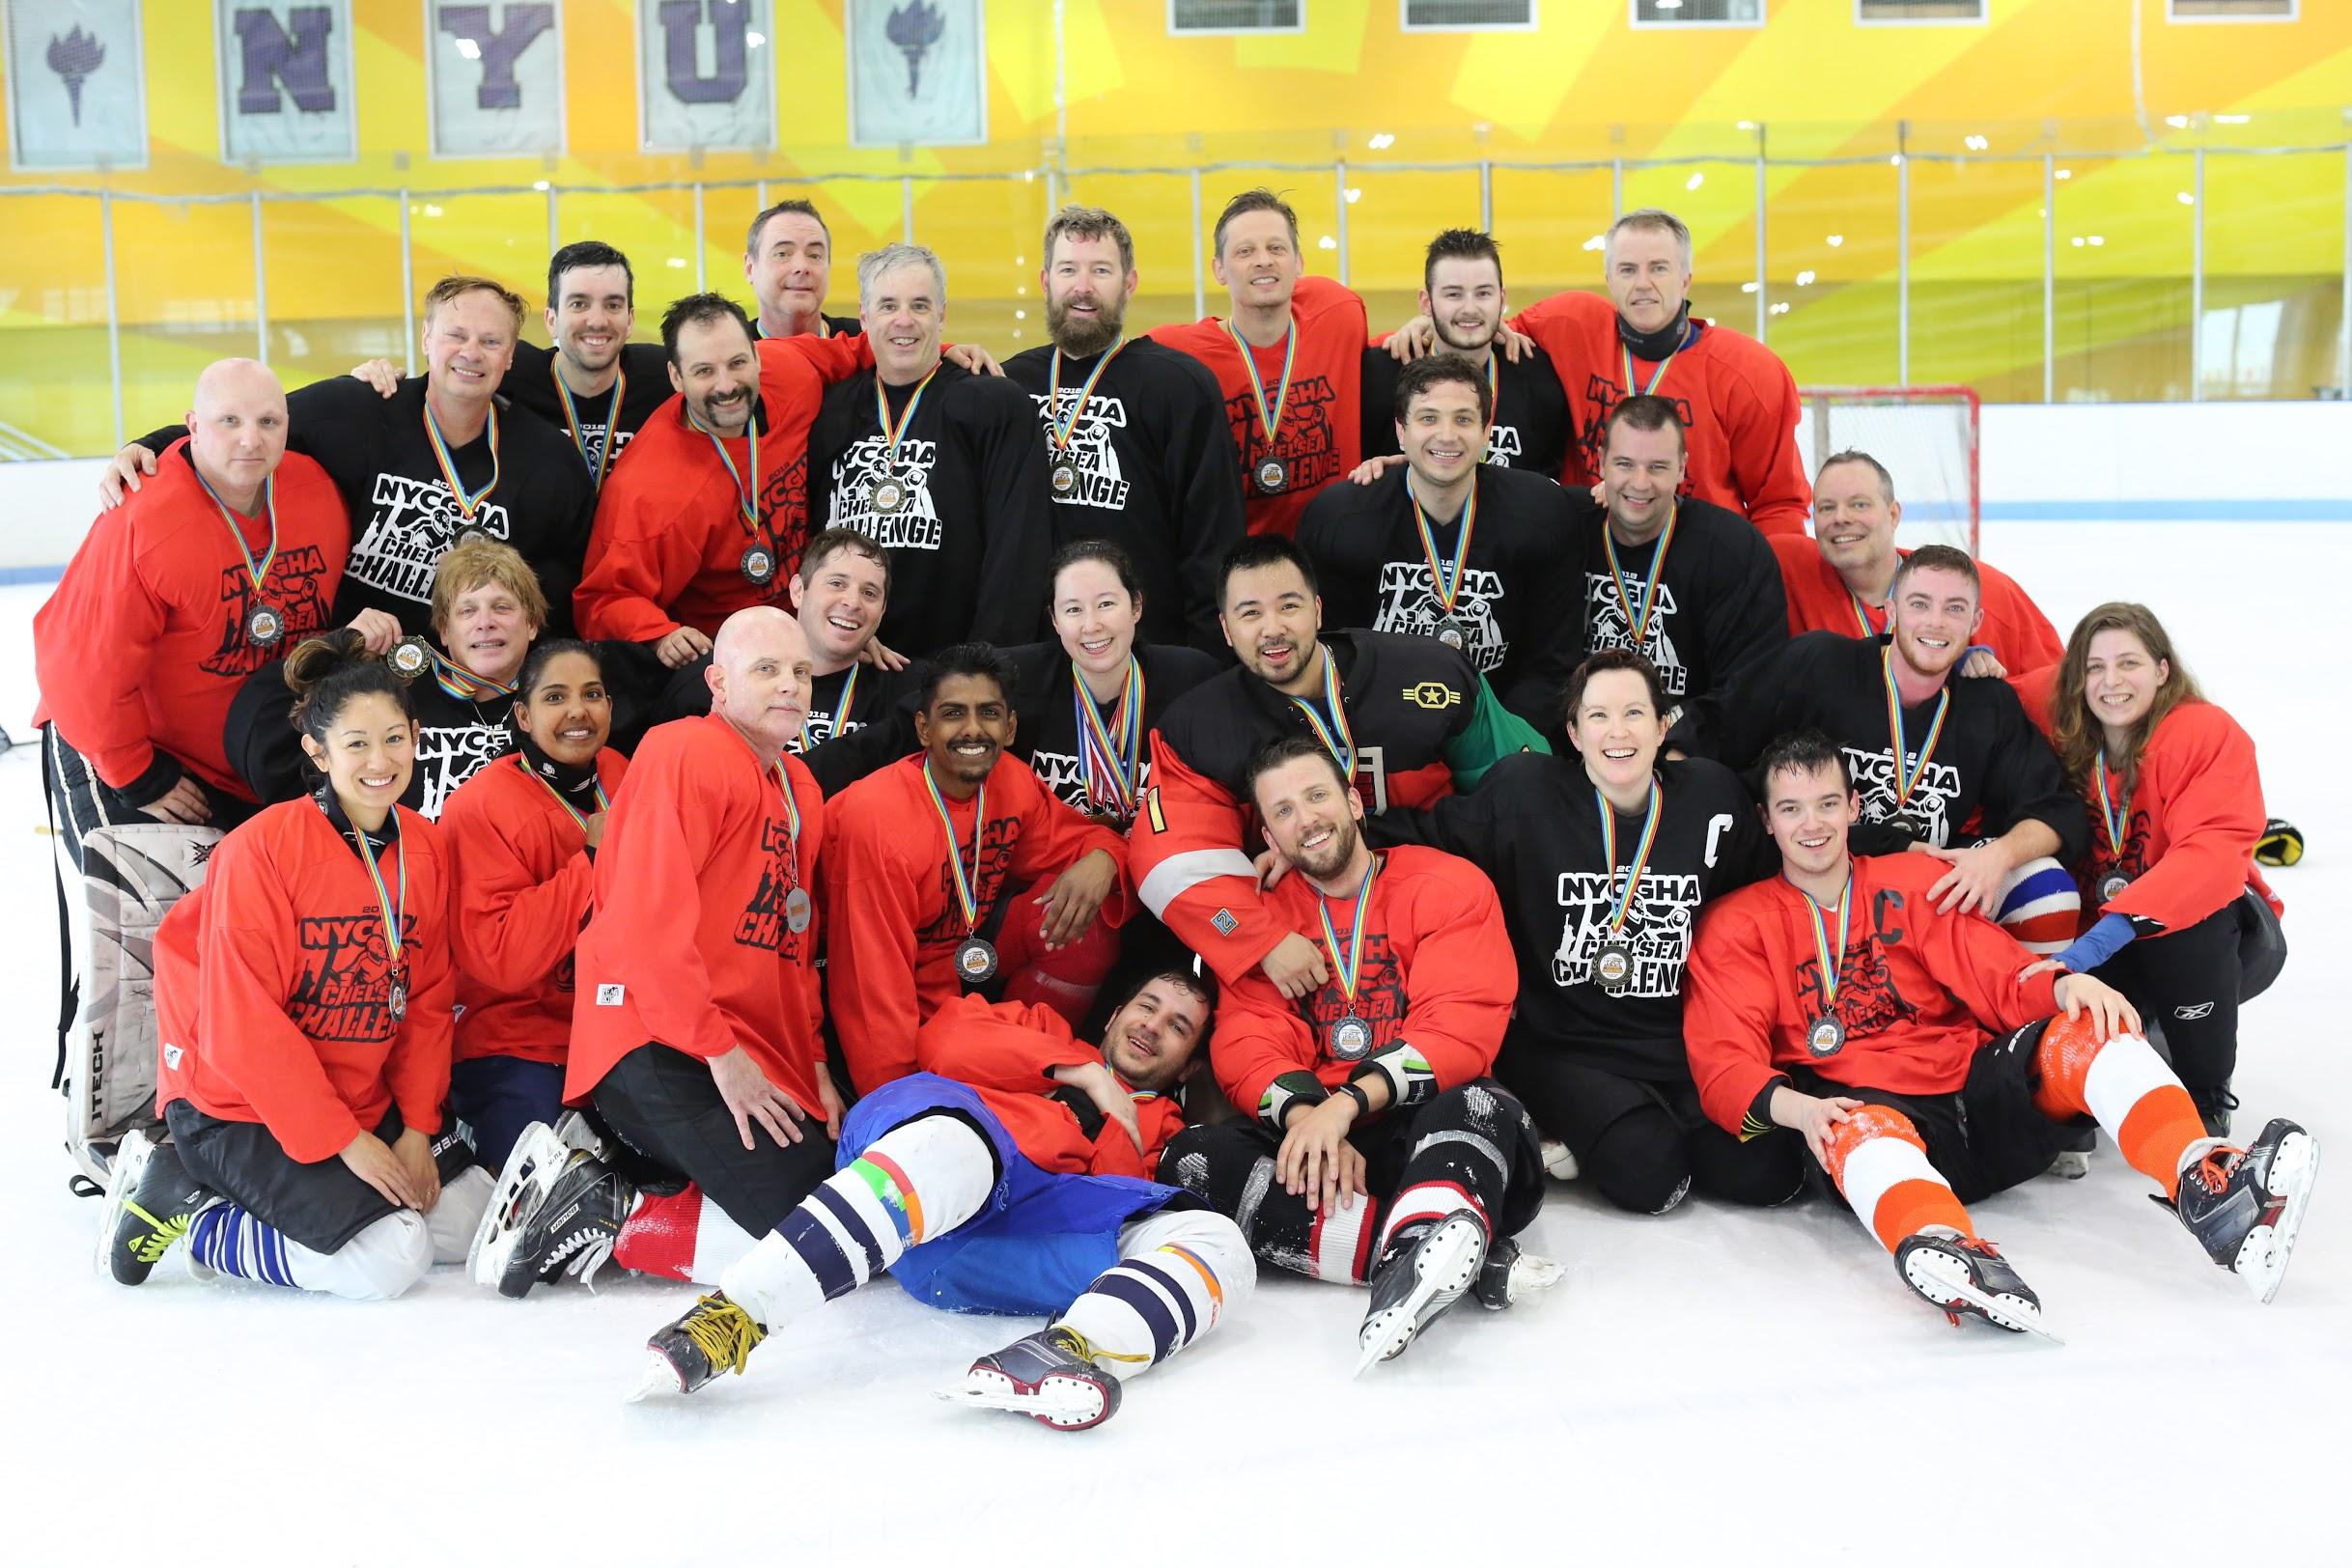 New York City Gay Hockey Association Celebrates World Pride With The